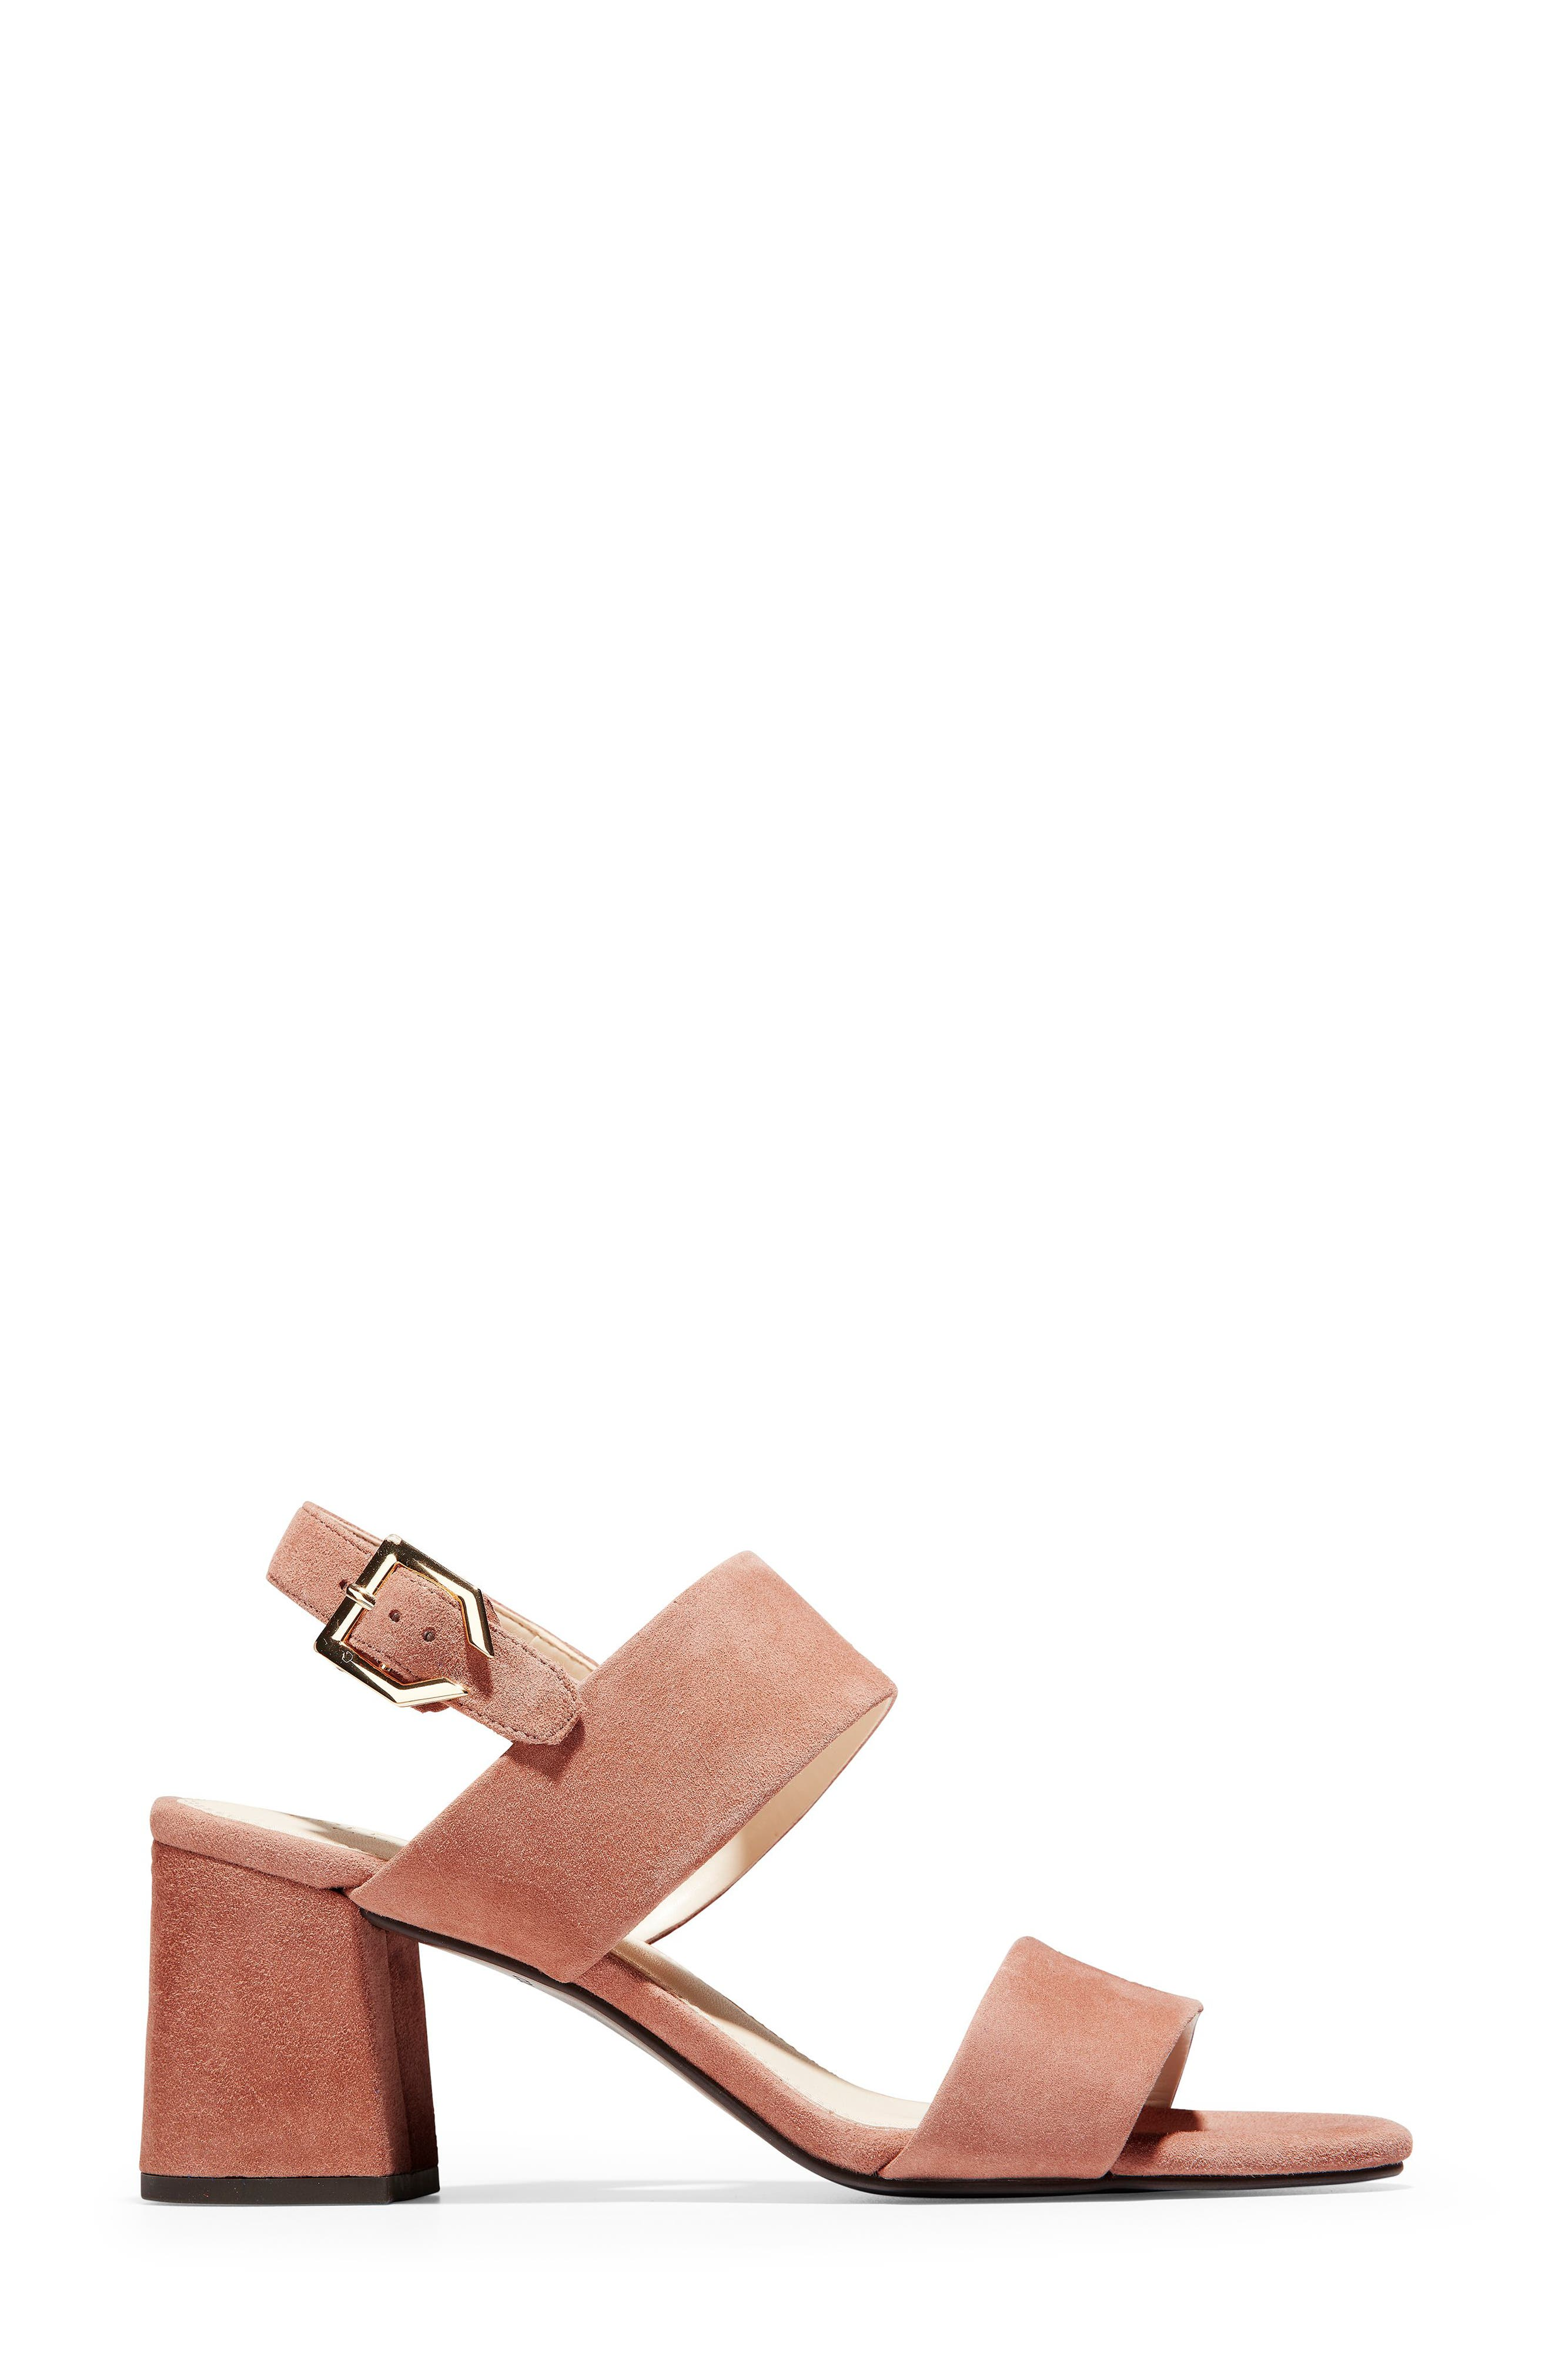 Avani Block Heel Sandal,                             Alternate thumbnail 3, color,                             MOCHA MOUSSE SUEDE